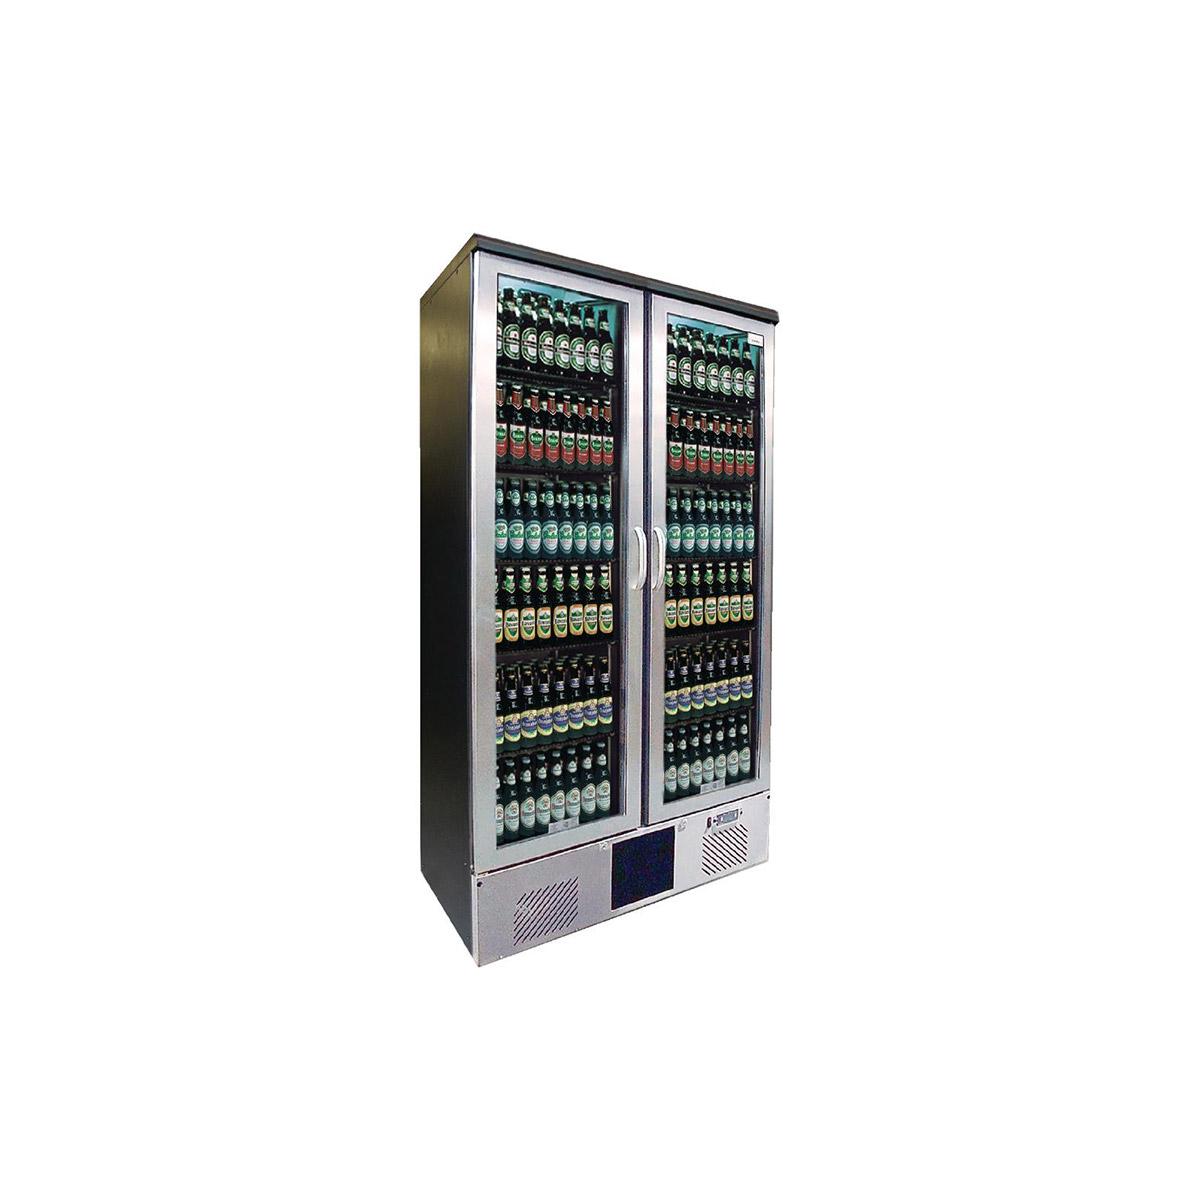 Gamko Maxiglass 2 Glass Door 500Ltr Bottle Cooler Cabinet MG2/500GCS